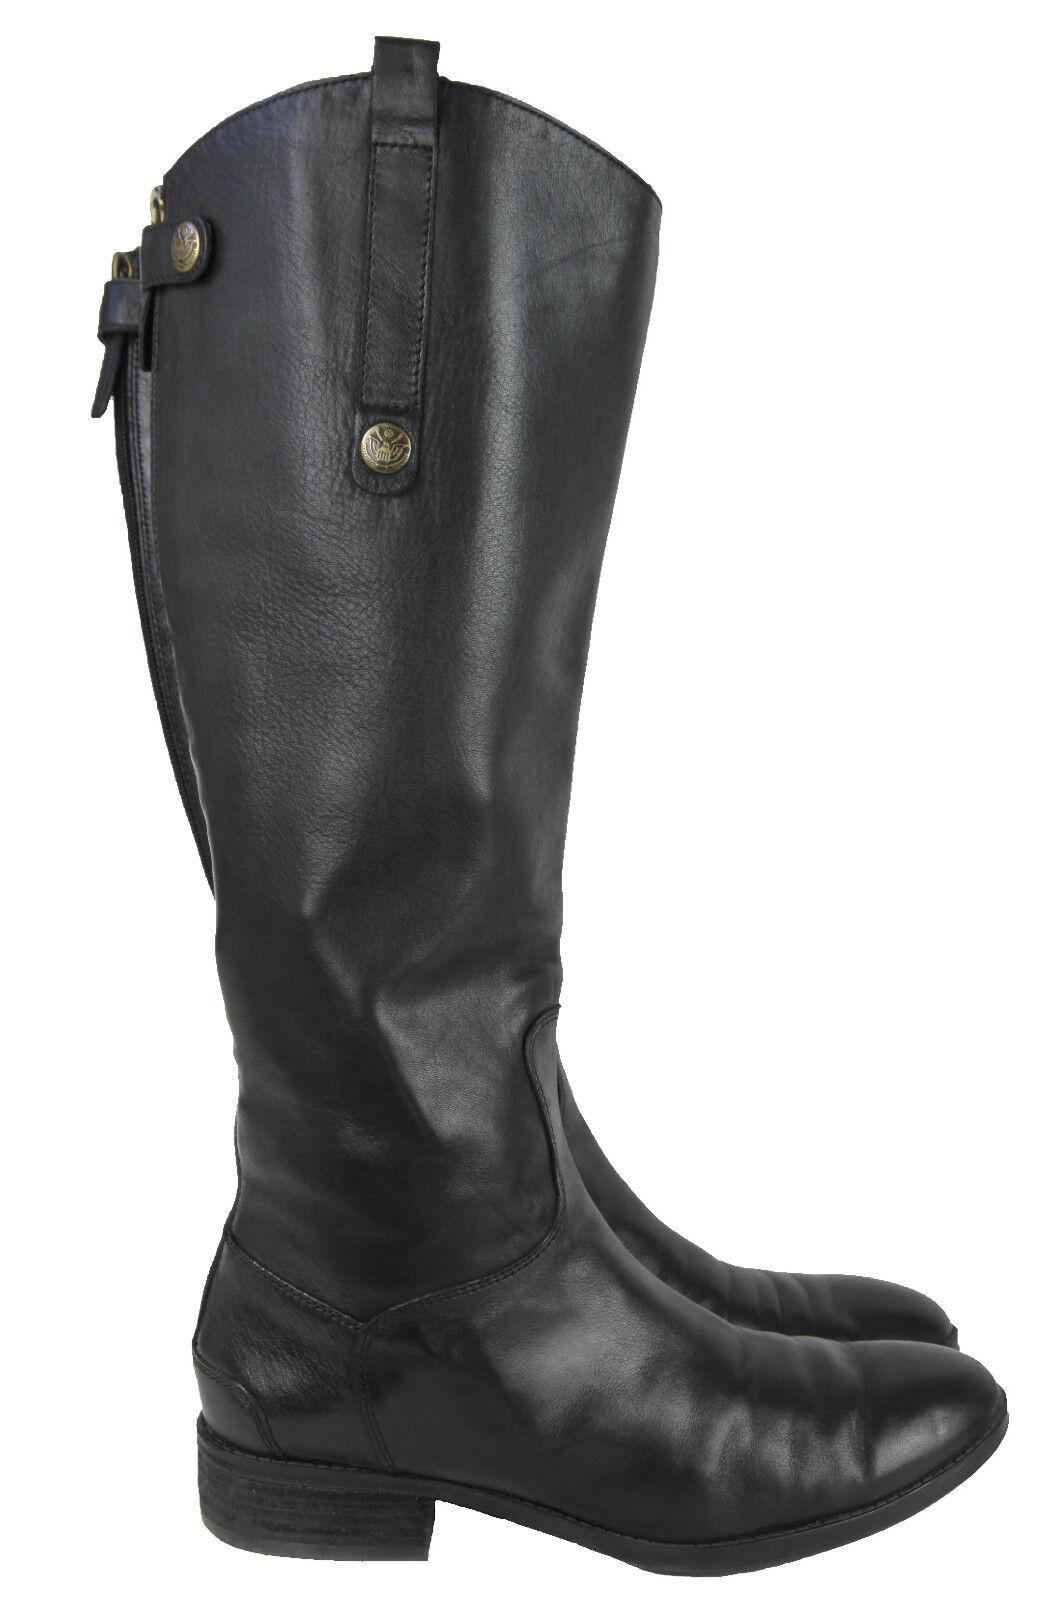 SAM EDELMAN 'Penny' Riding stivali Tall Leather Zip nero Leather avvio 9M